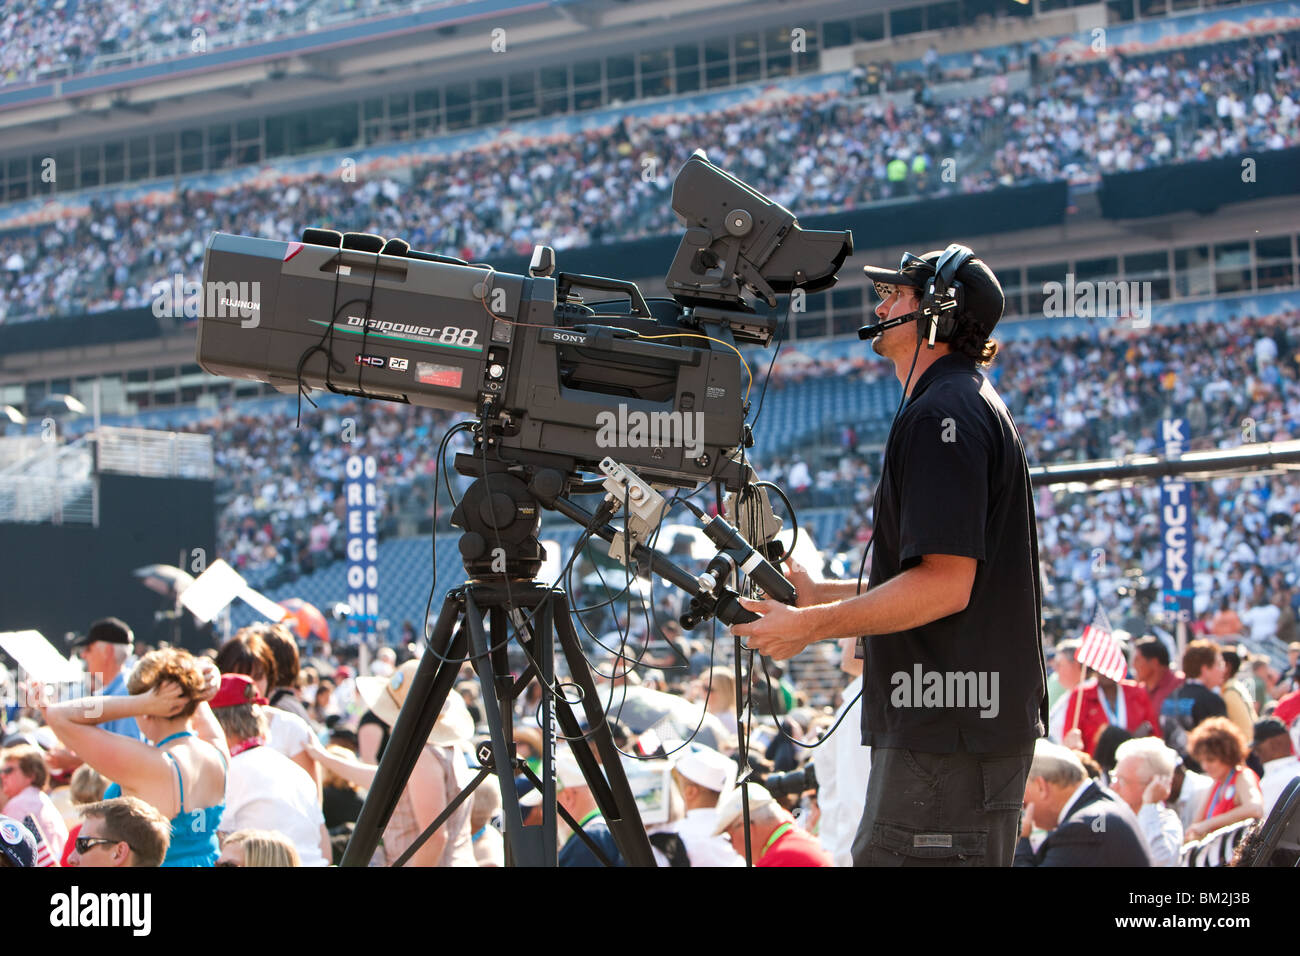 HD Camera at Invesco Field - Stock Image